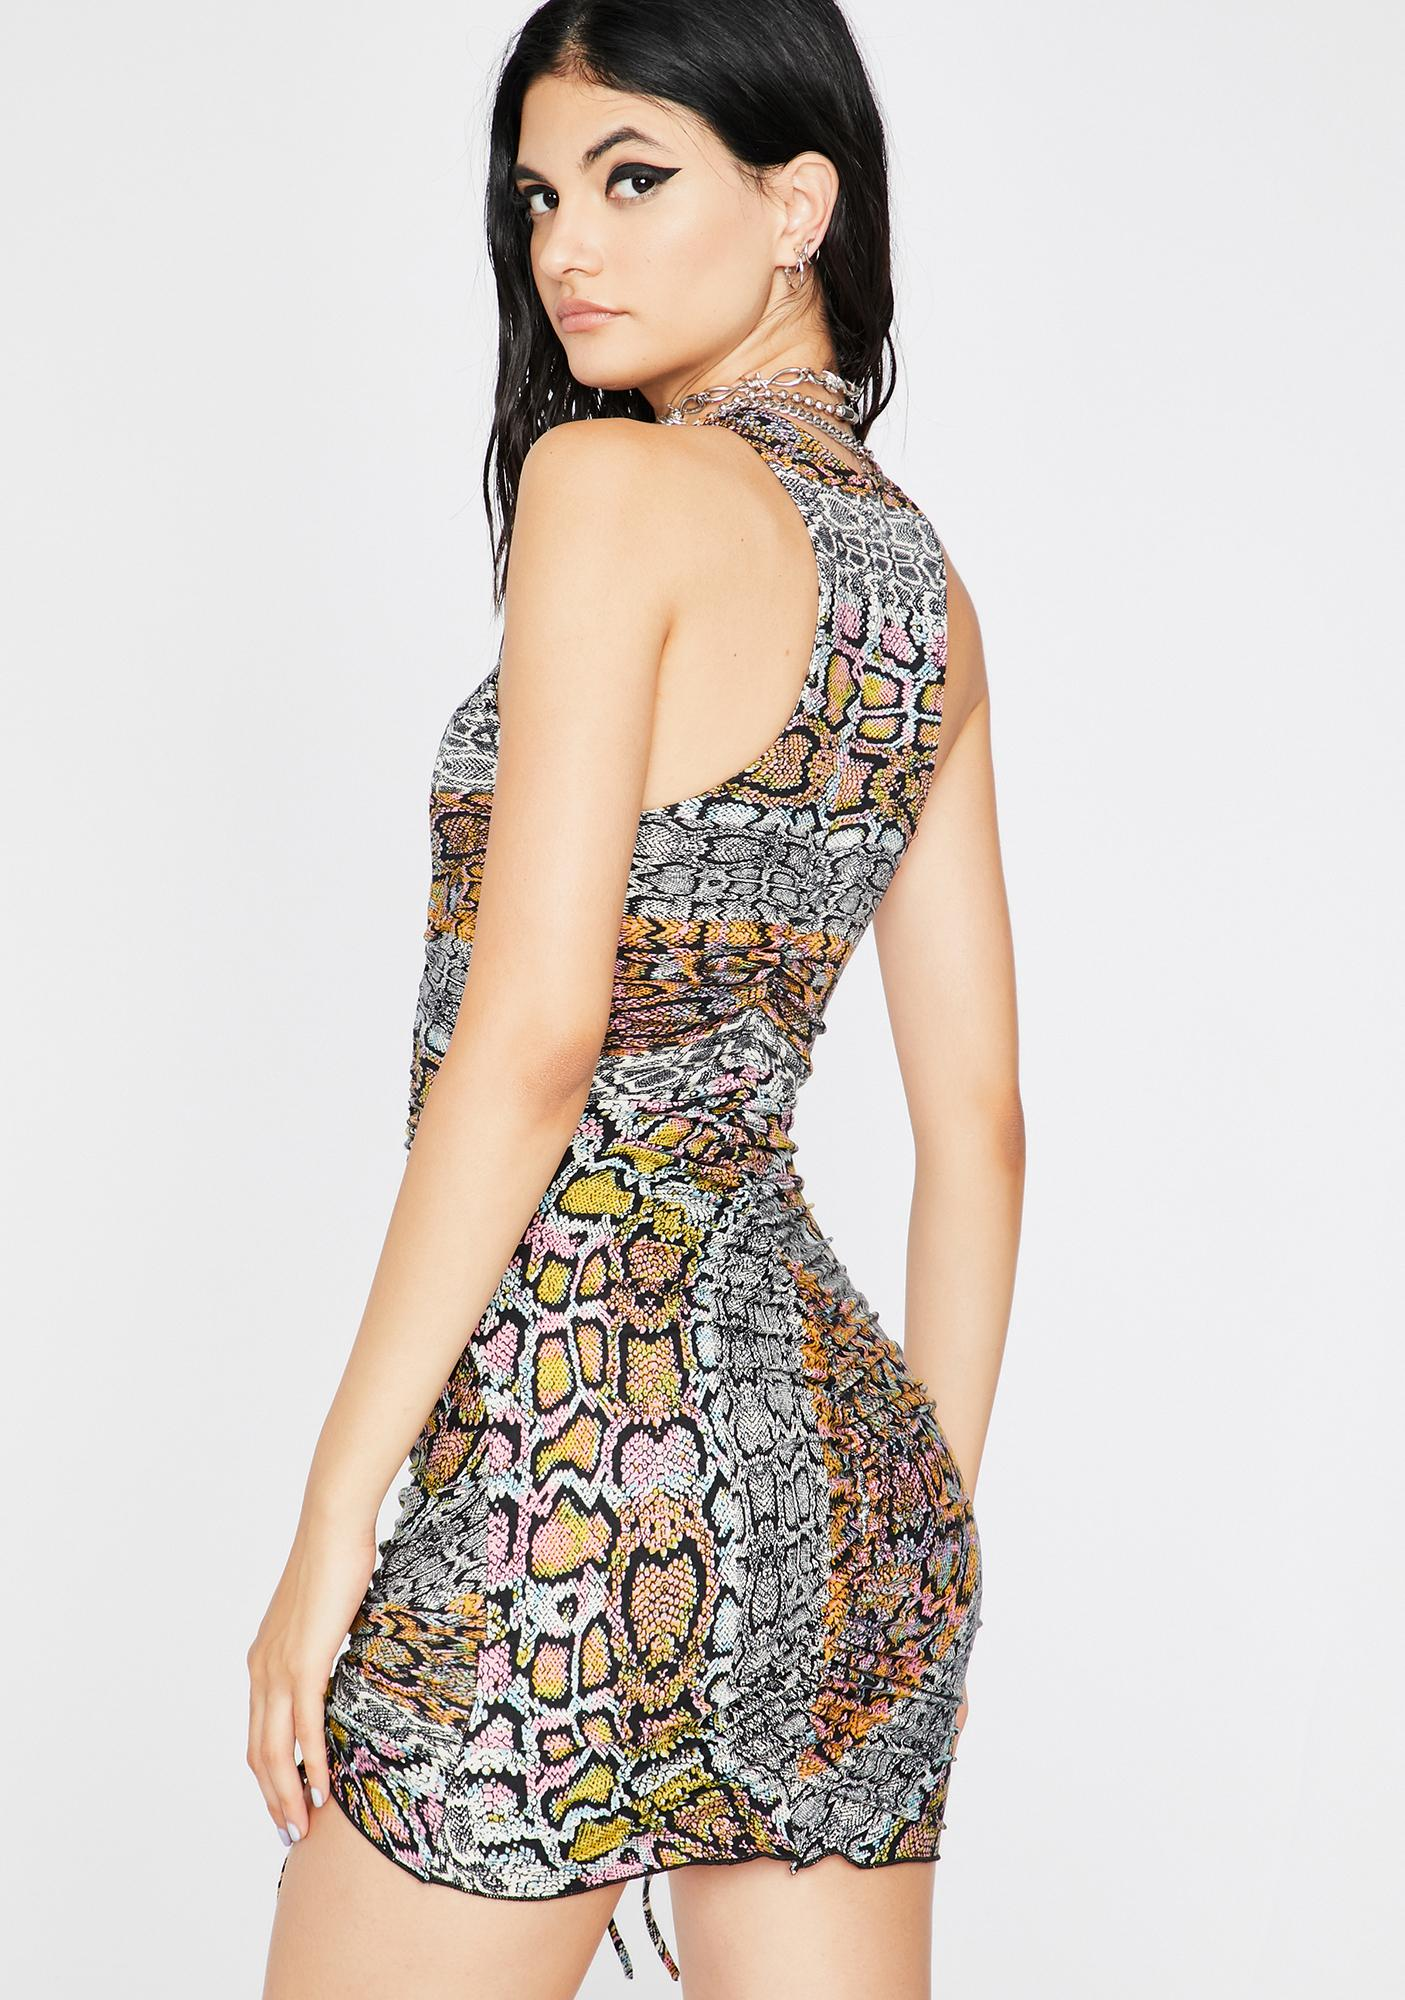 Constricted Cutie Snakeskin Print Mini Dress